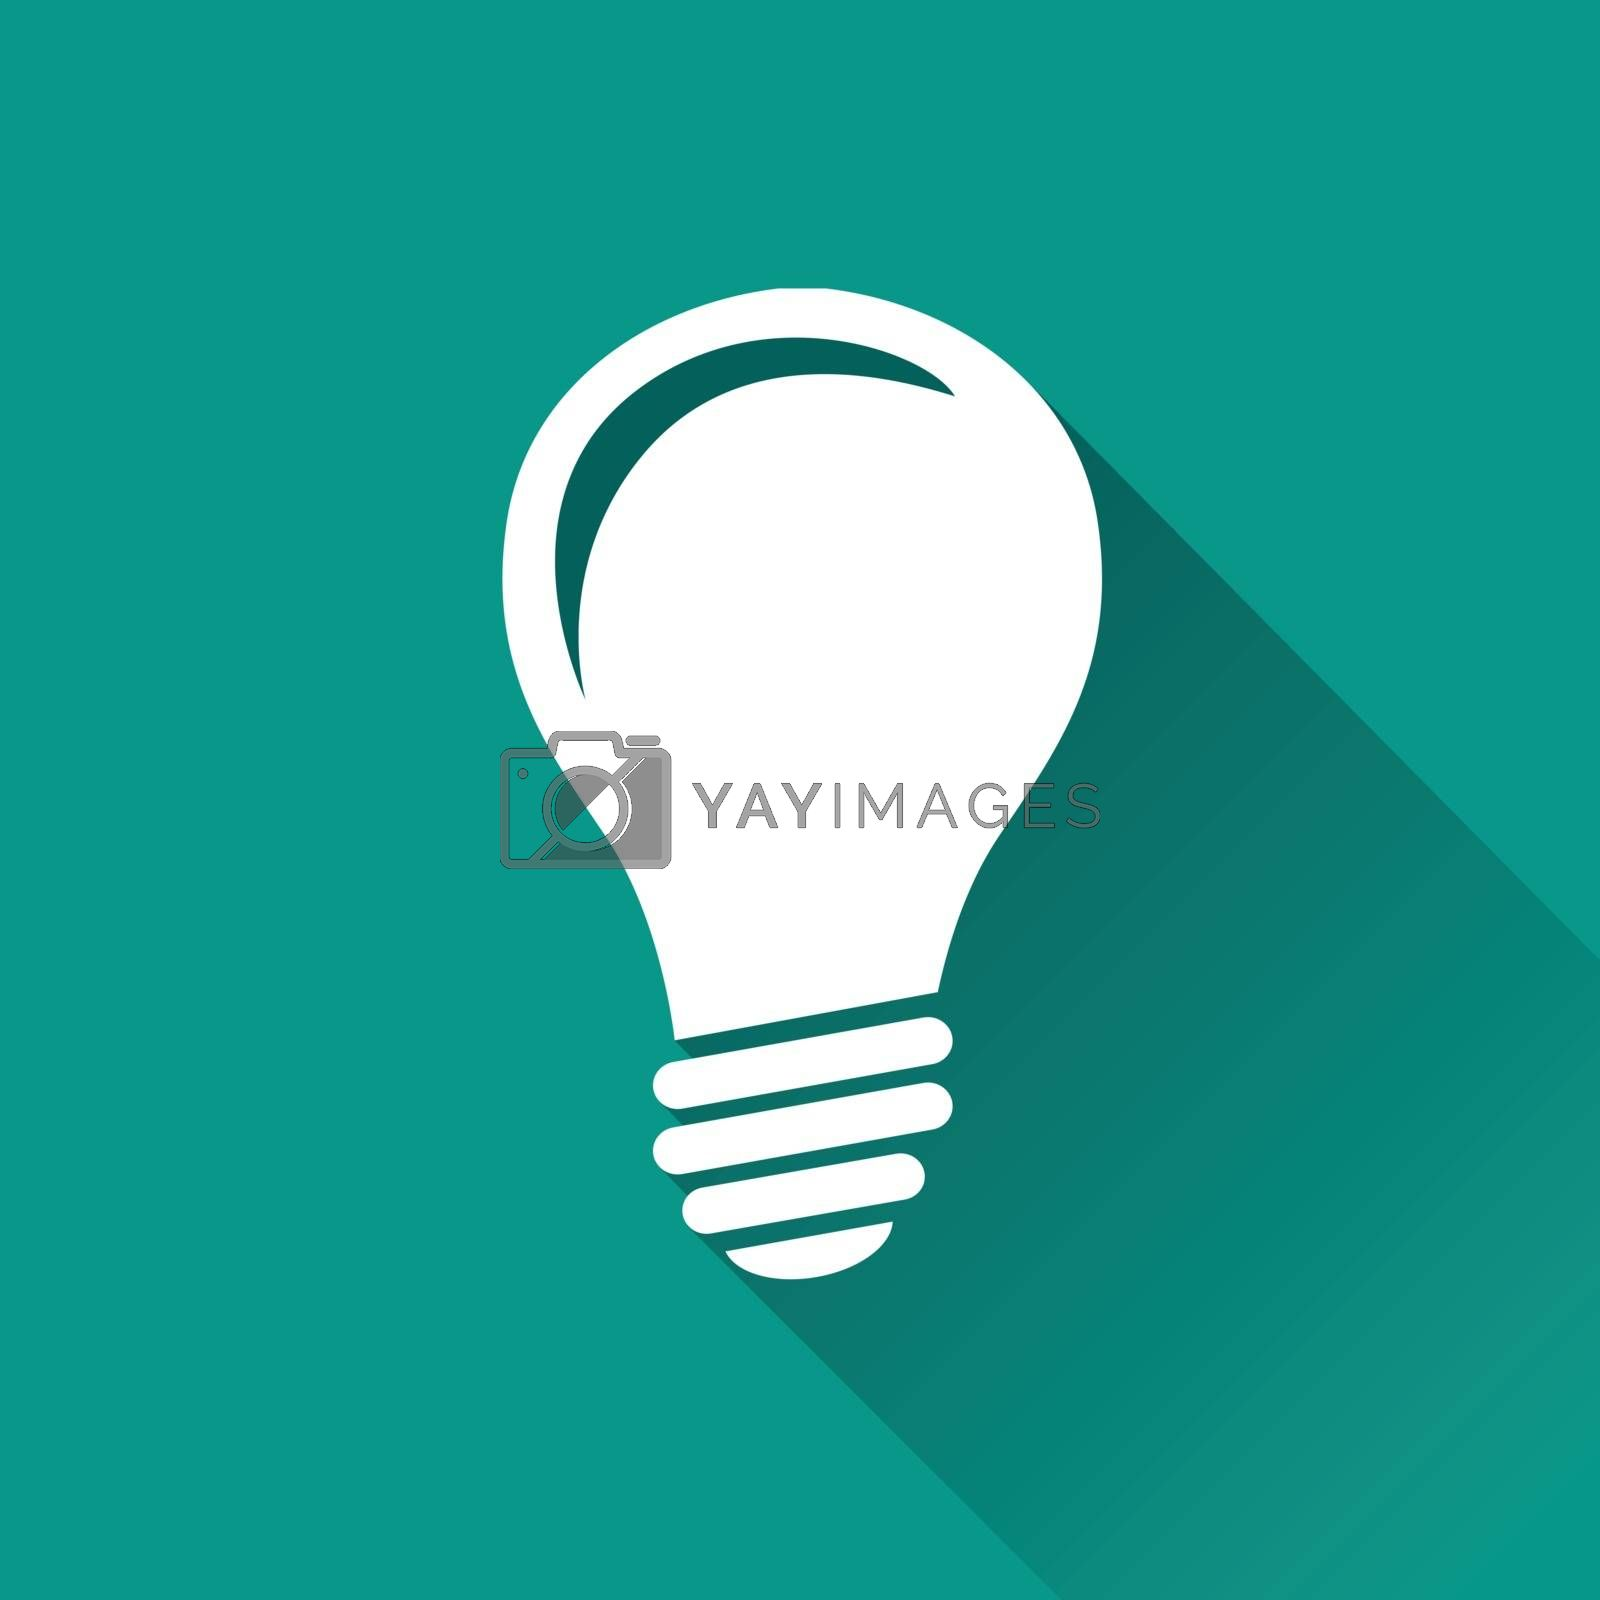 Royalty free image of lightbulb flat design icon by nickylarson974